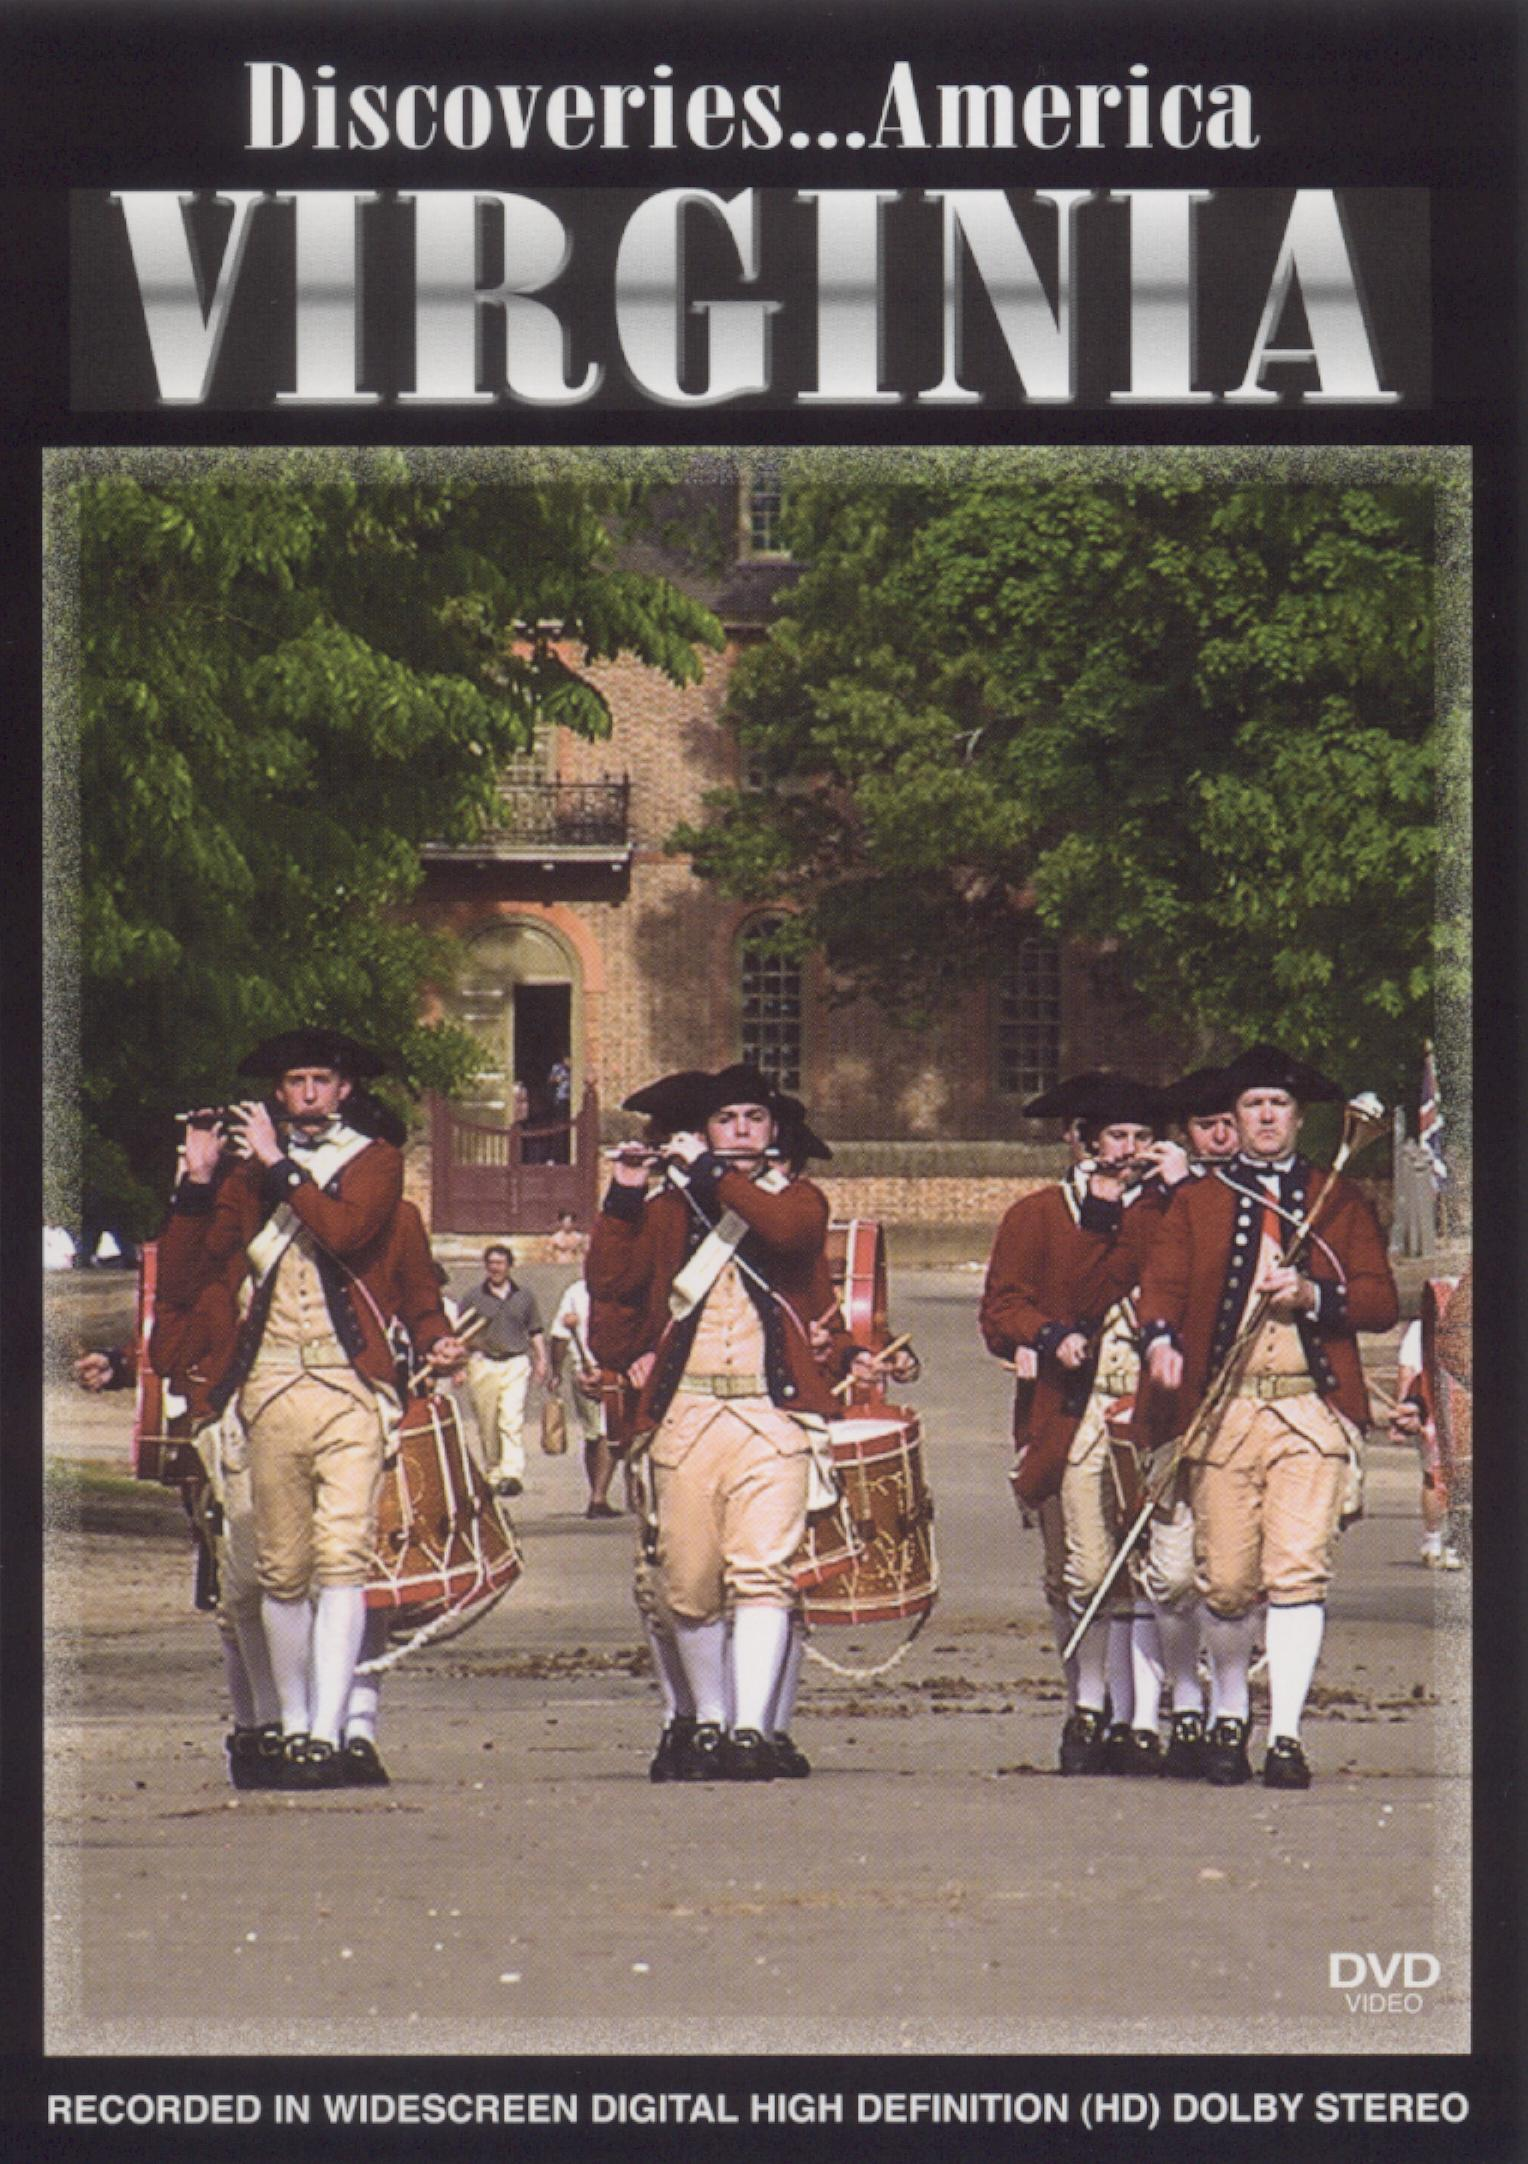 Discoveries... America: Virginia